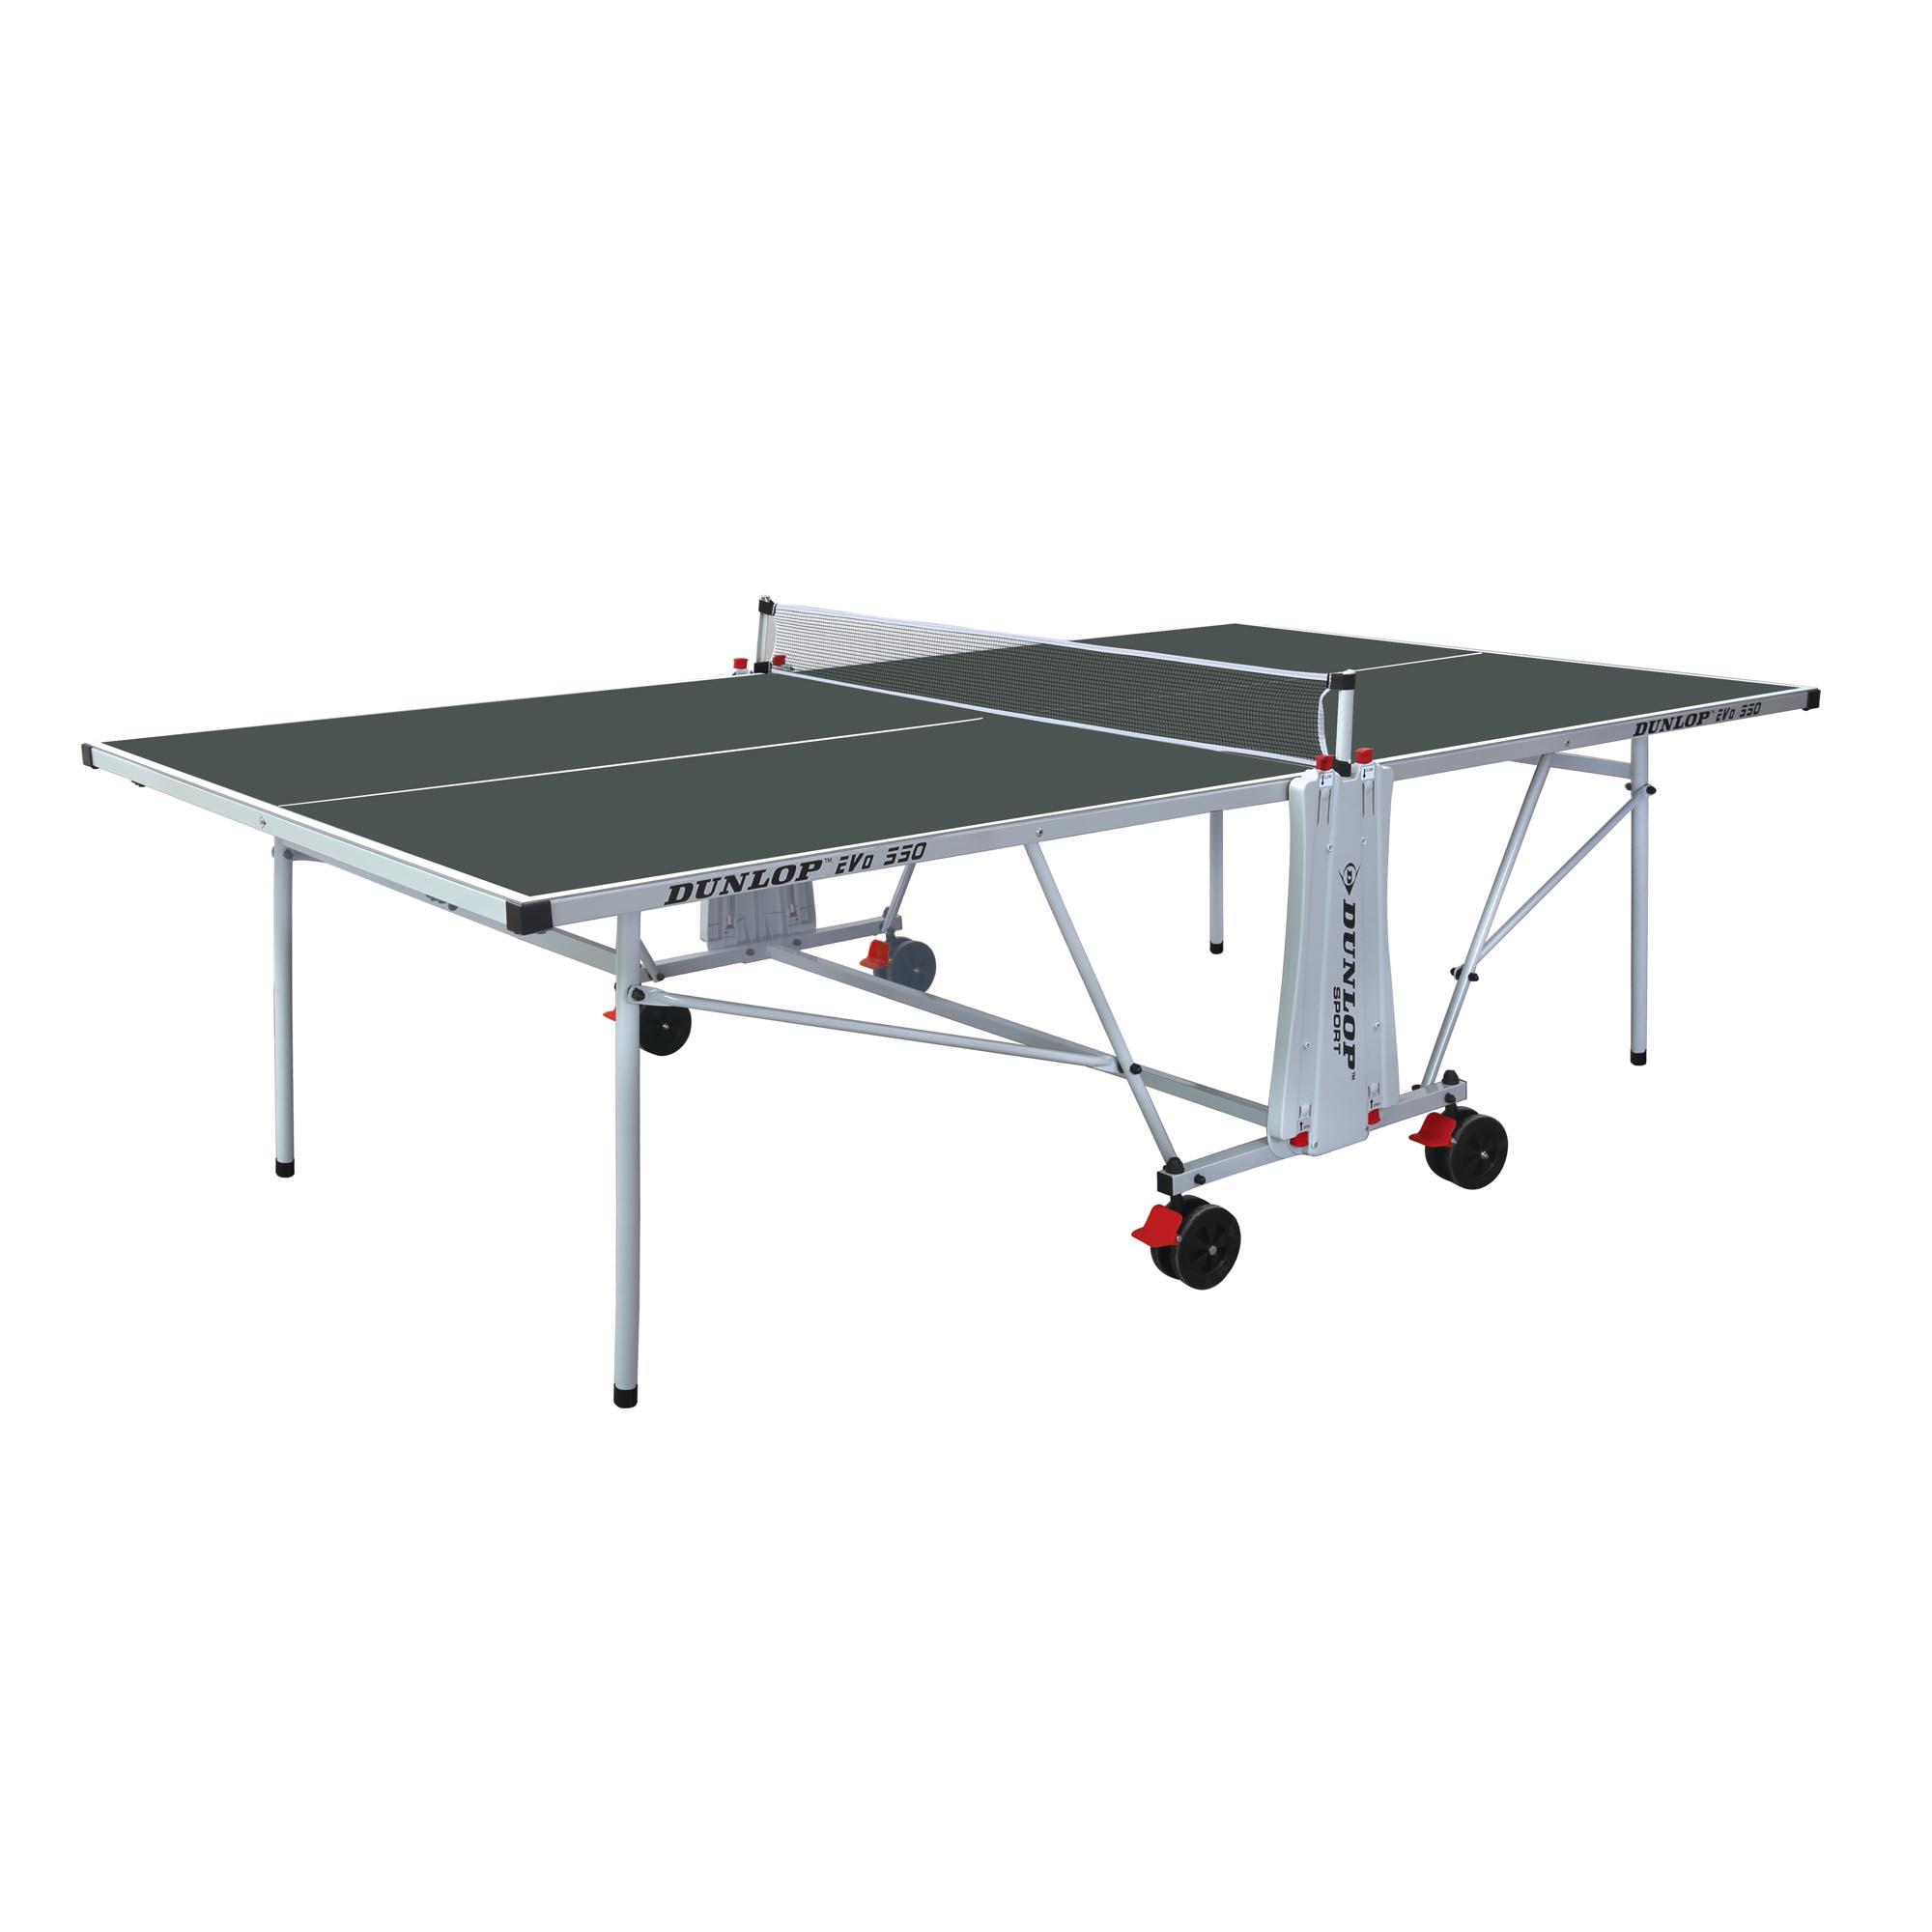 Dunlop Evo 550 Outdoor Table Tennis Table  Green